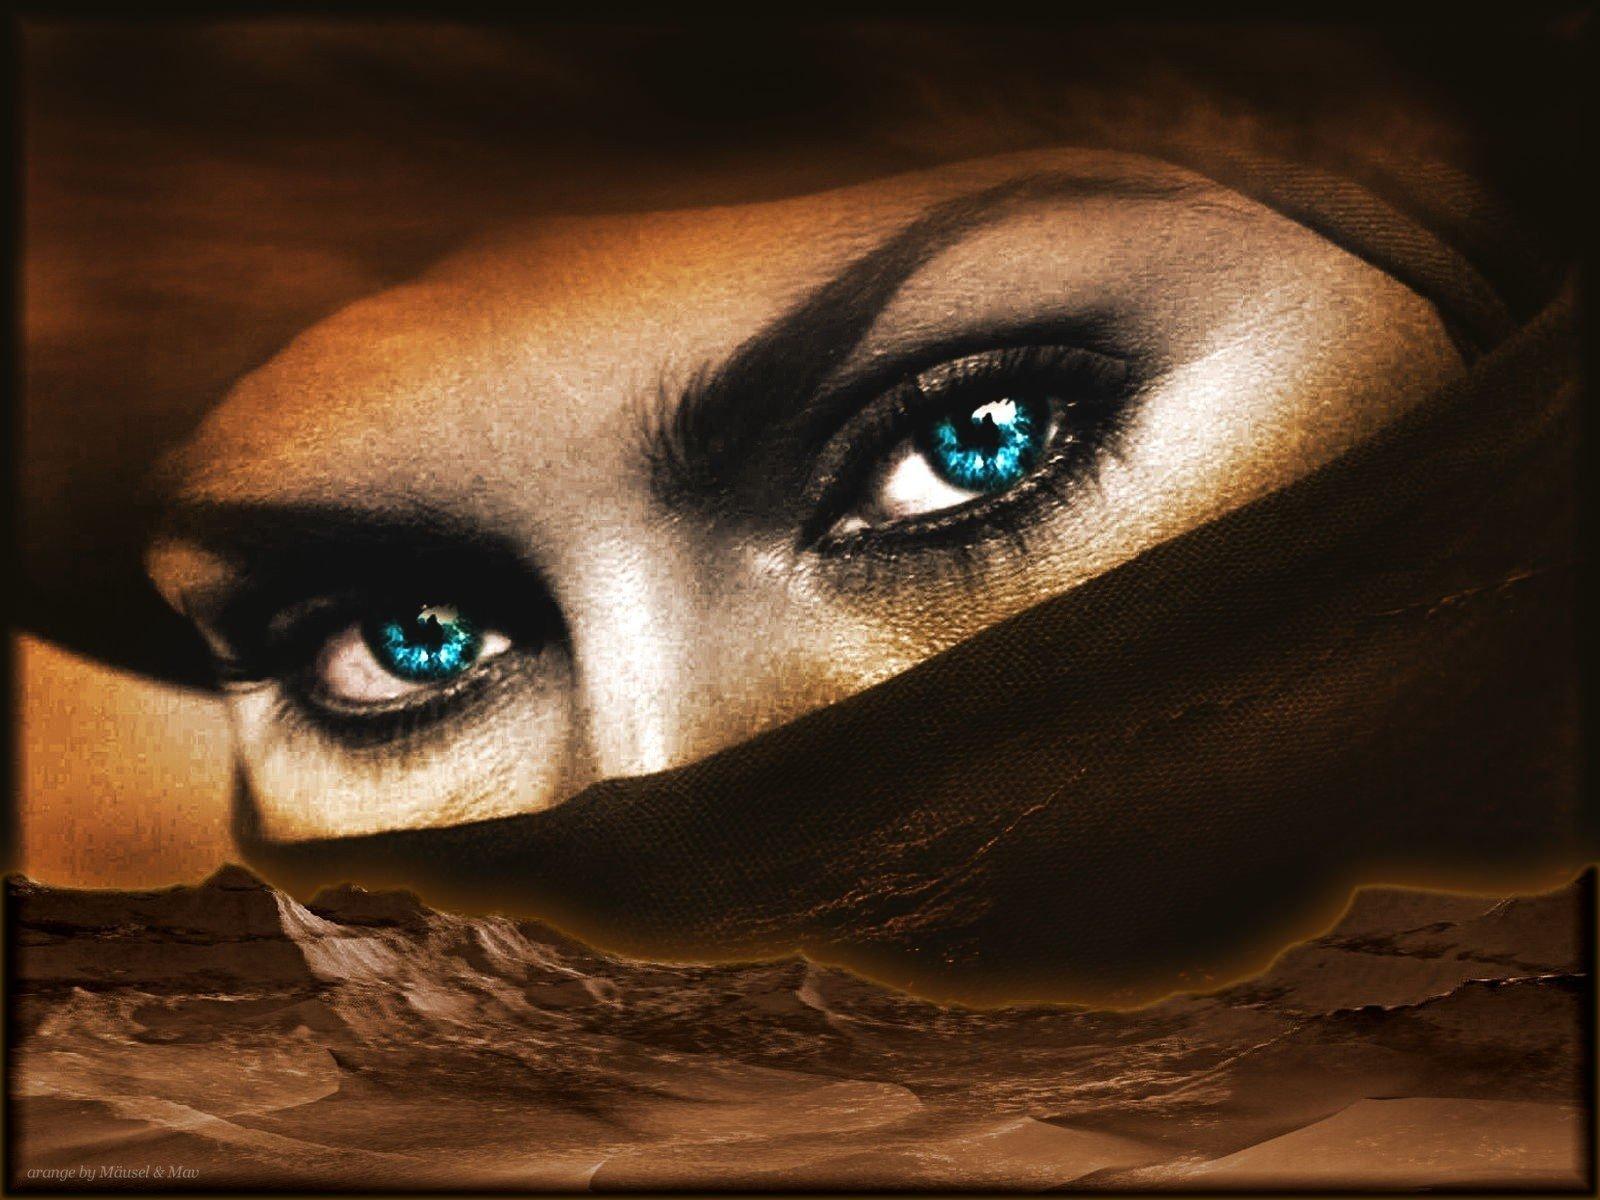 Desert Eyes Wallpapers Metal Graphic Arts Heavy Metal wallpapers 1600x1200